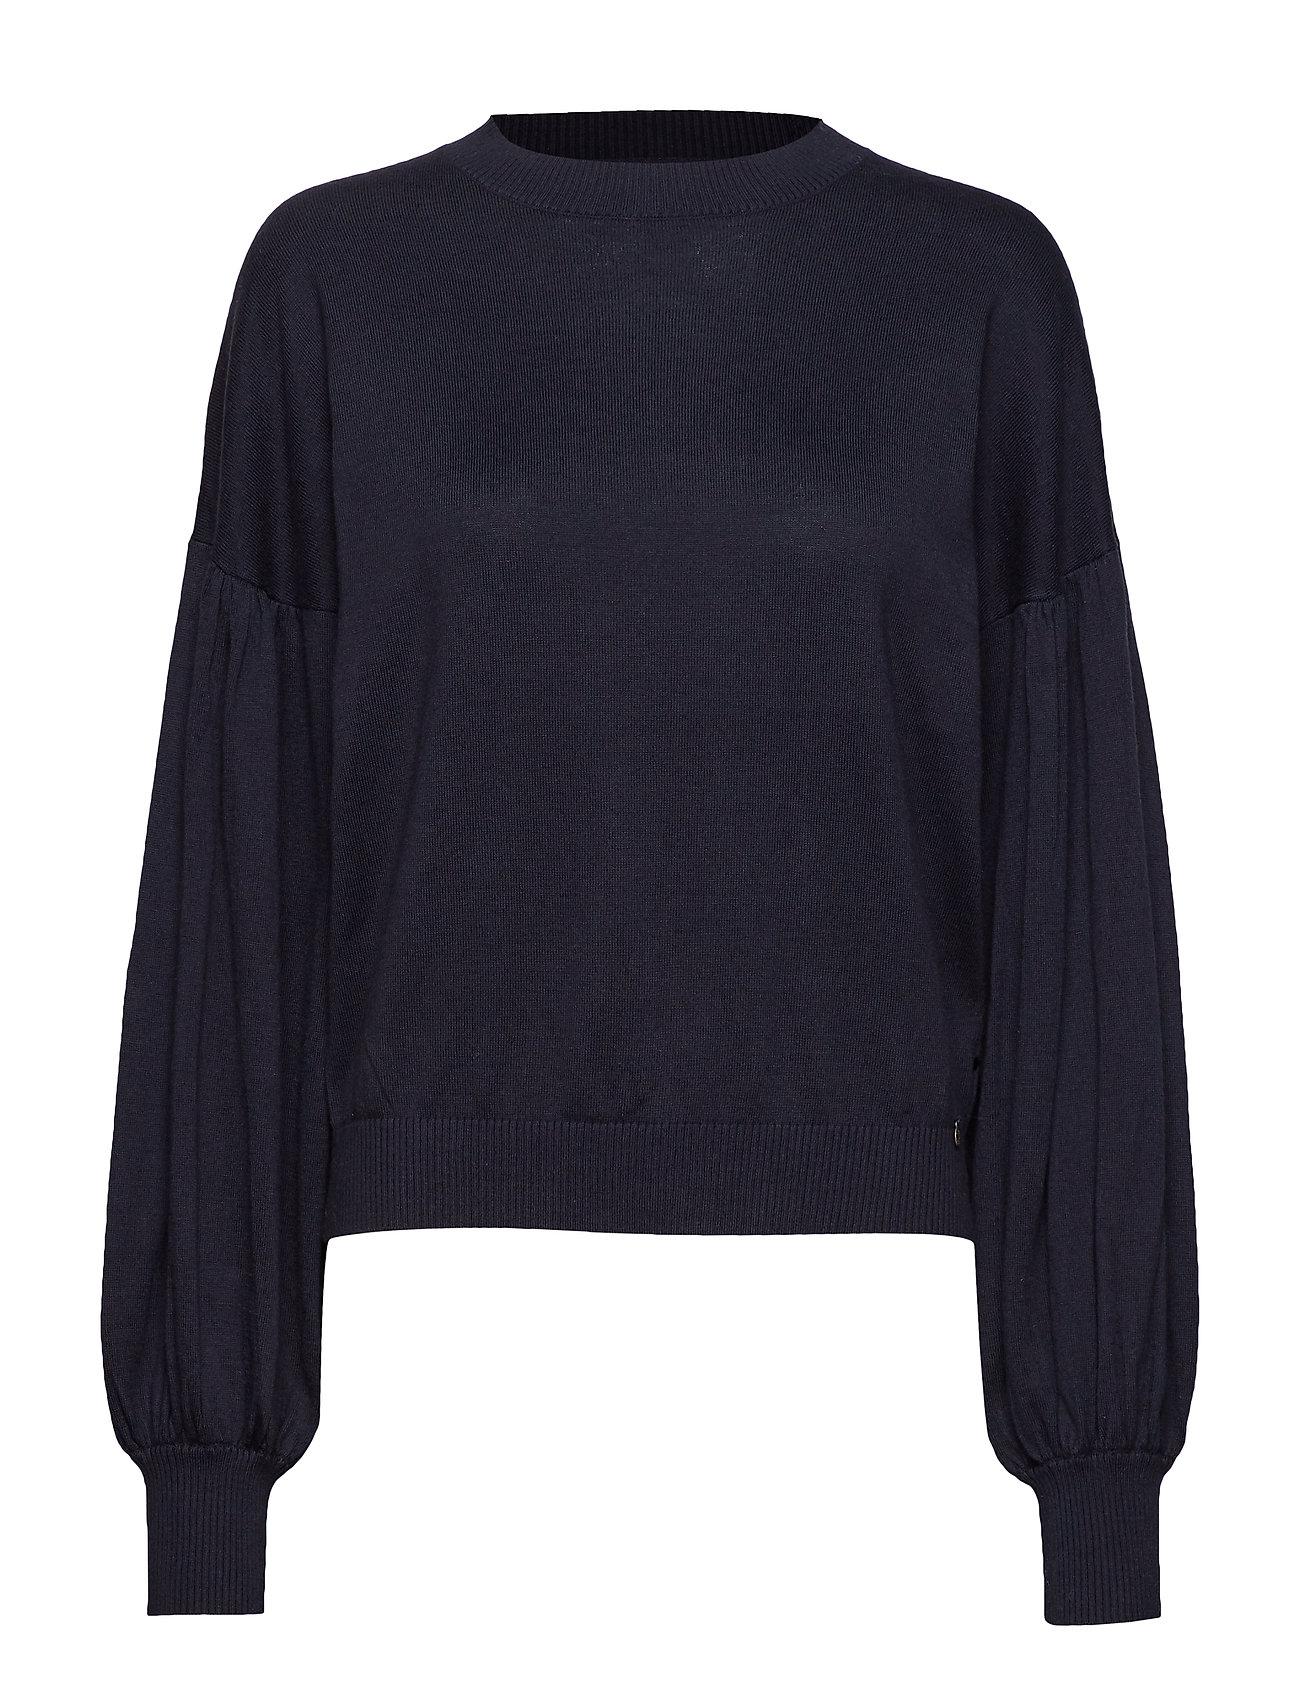 Twist & Tango Beatrice Sweater Blackish Blue - BLACKISH BLUE